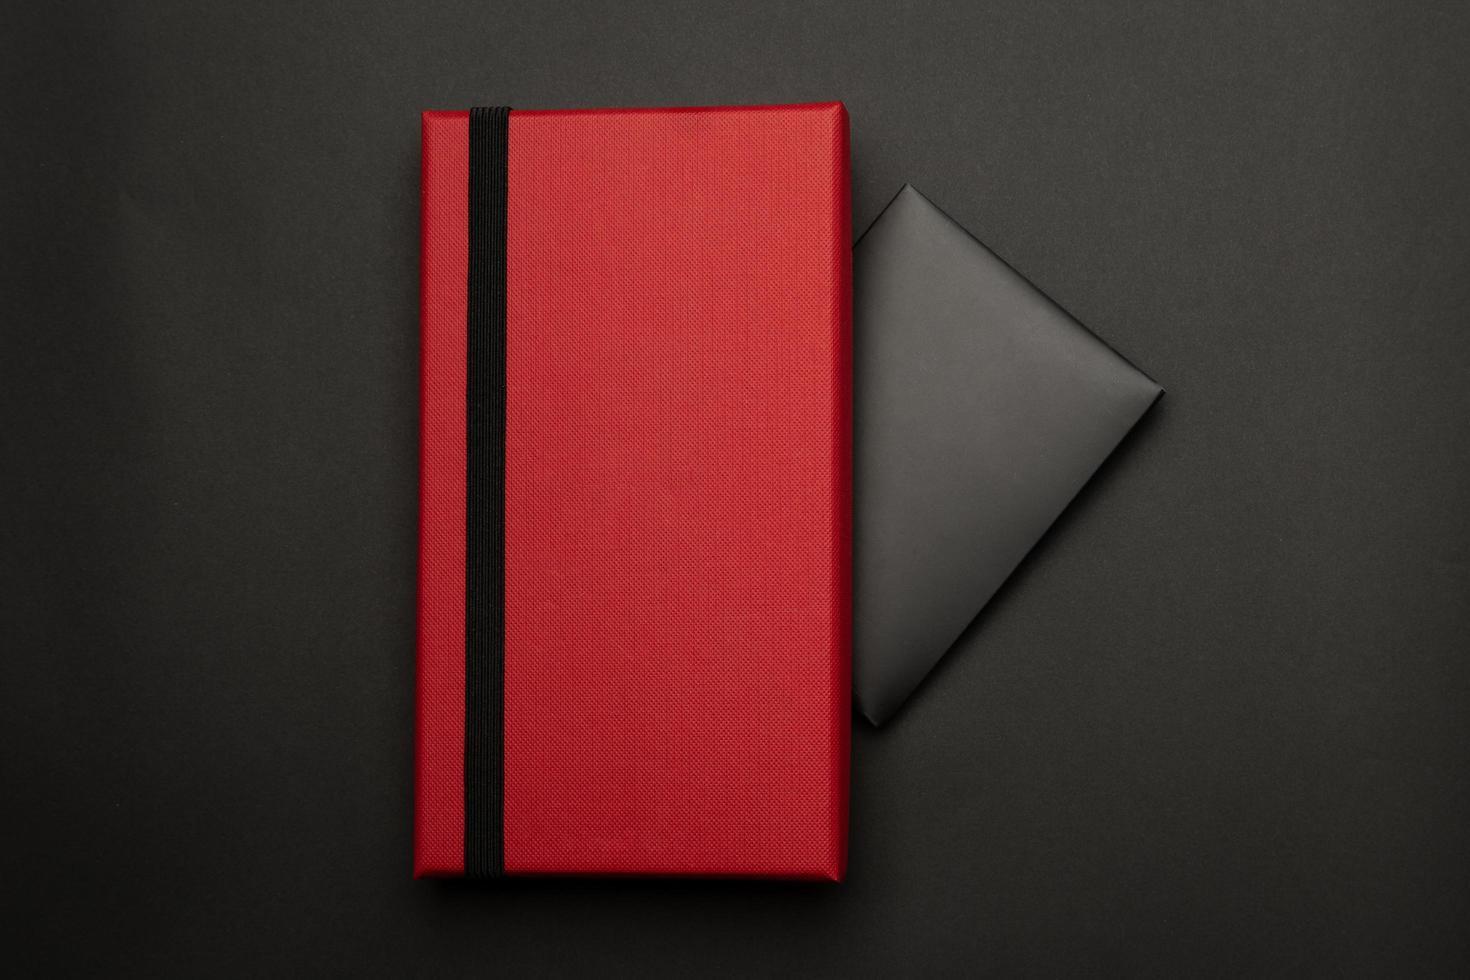 röd presentask med svart kuvertkort foto